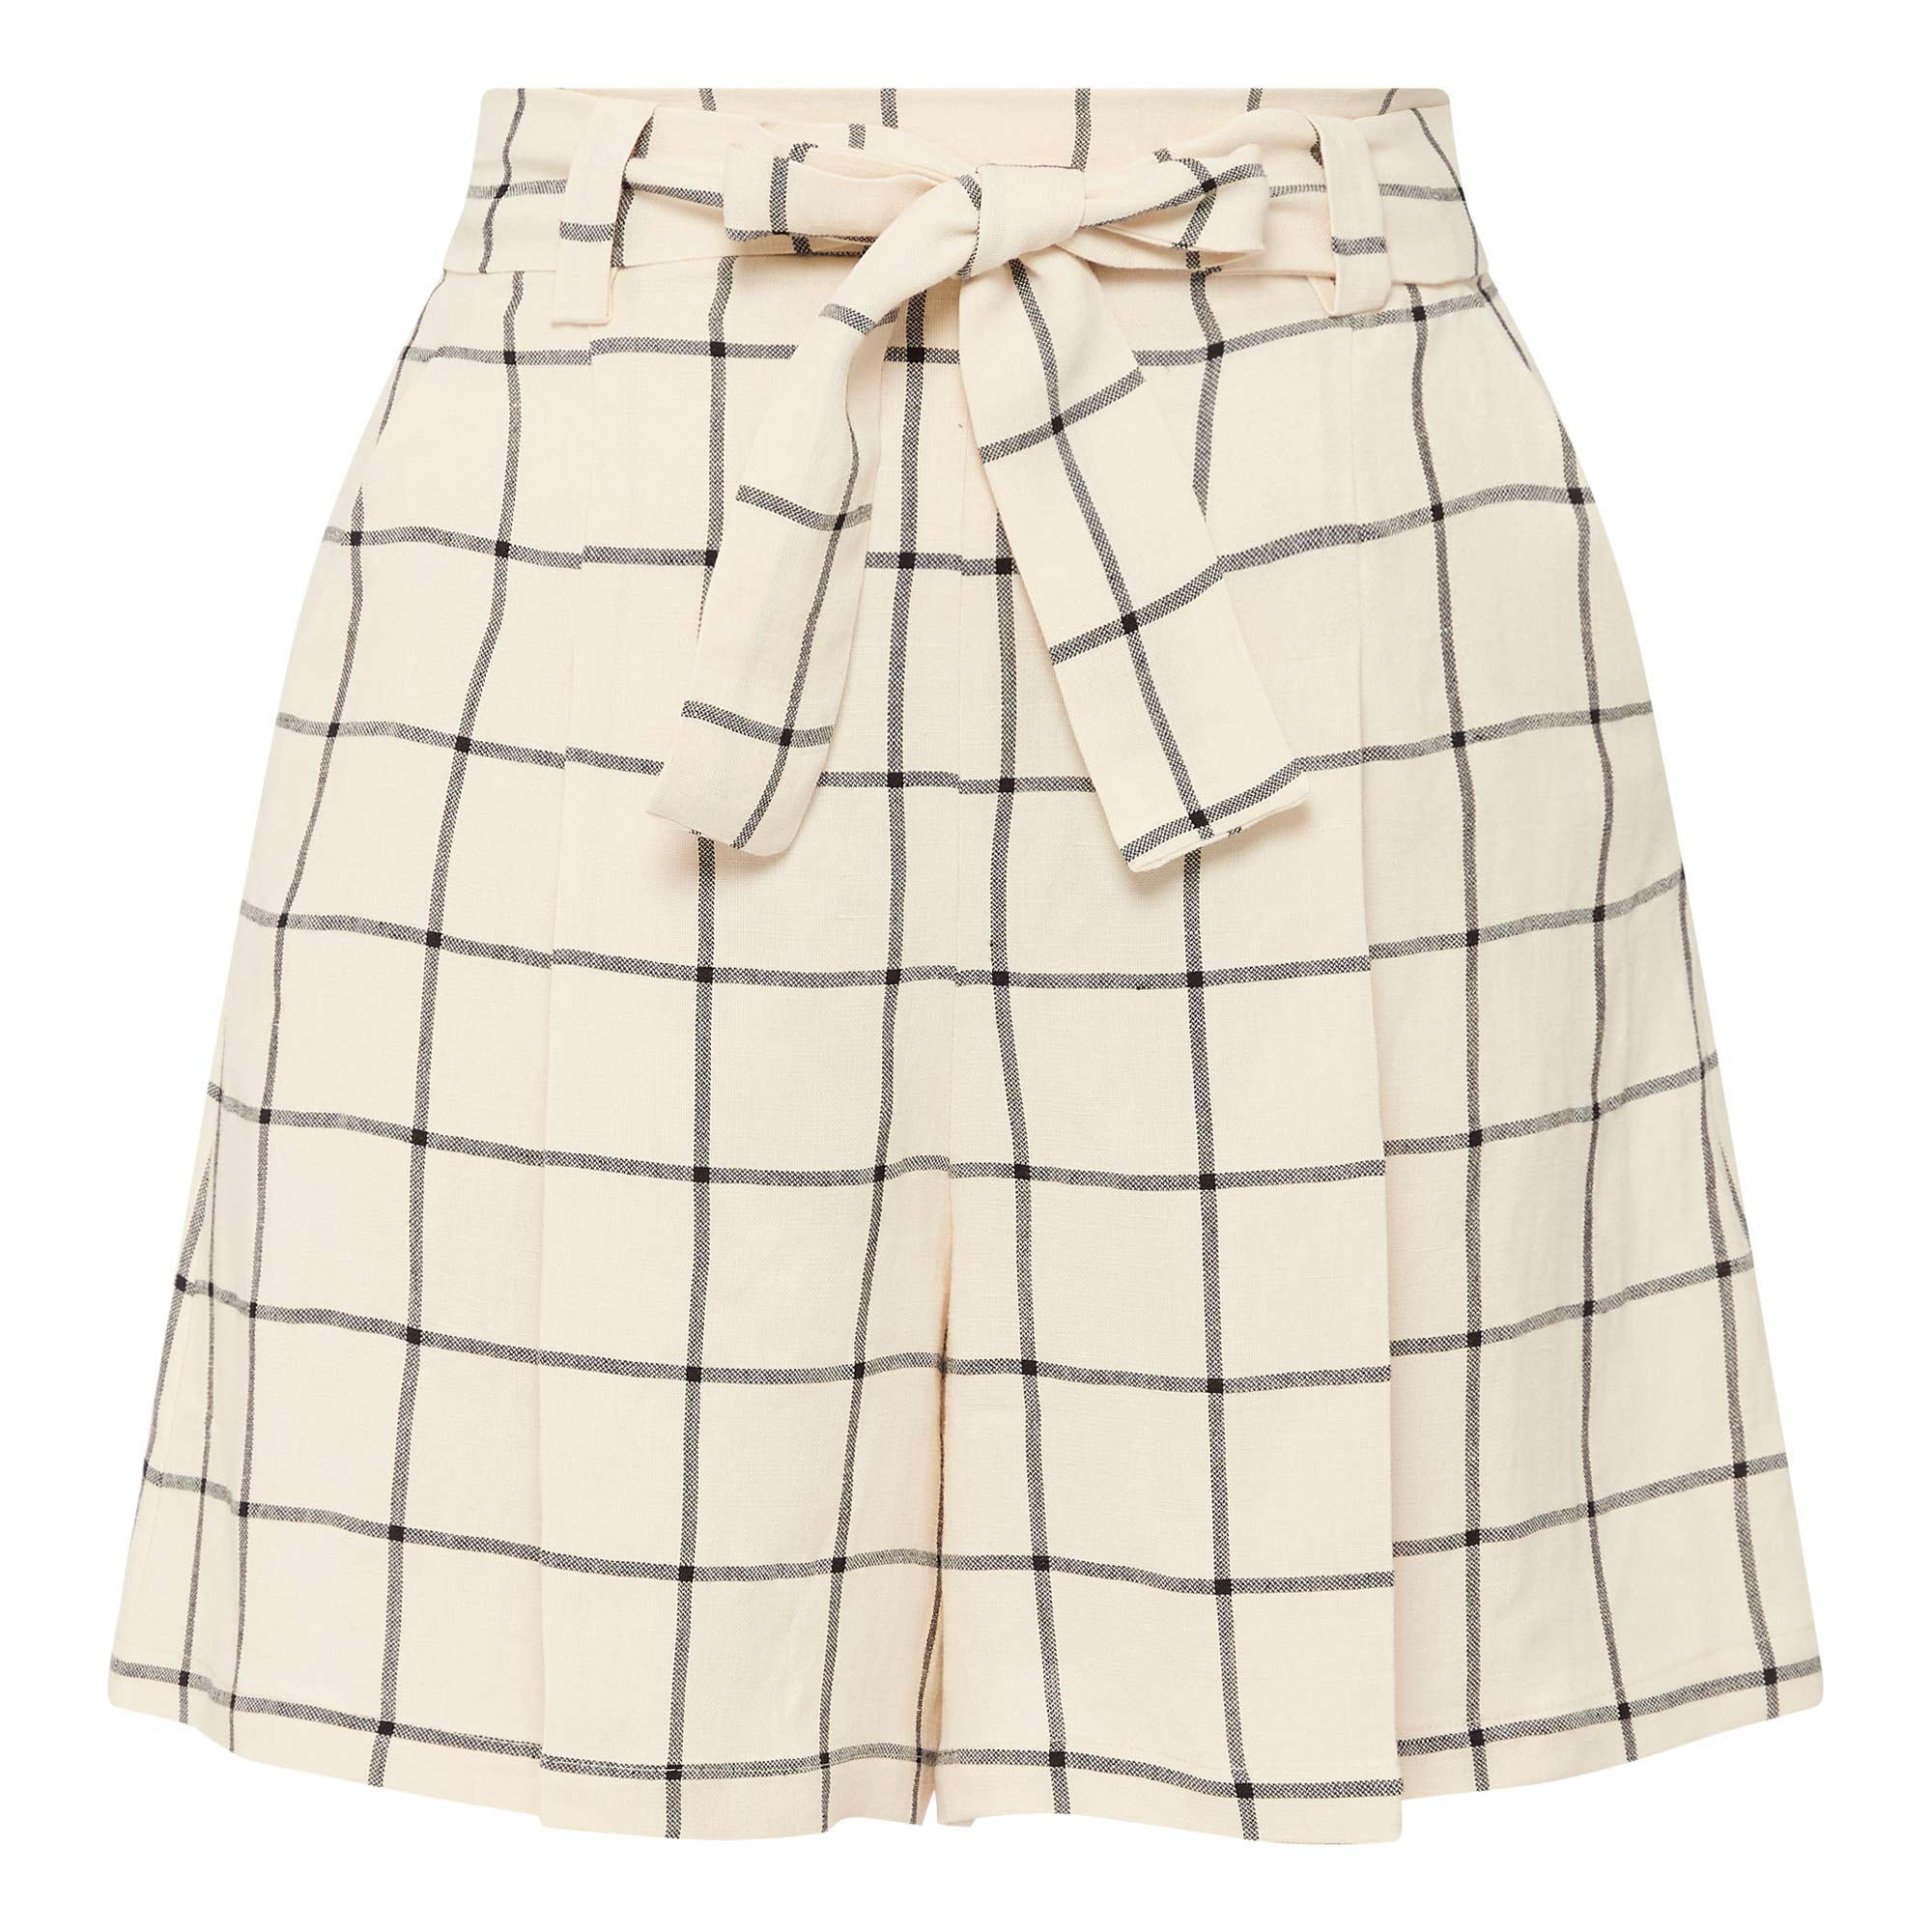 136815954: Check Cropped Shorts